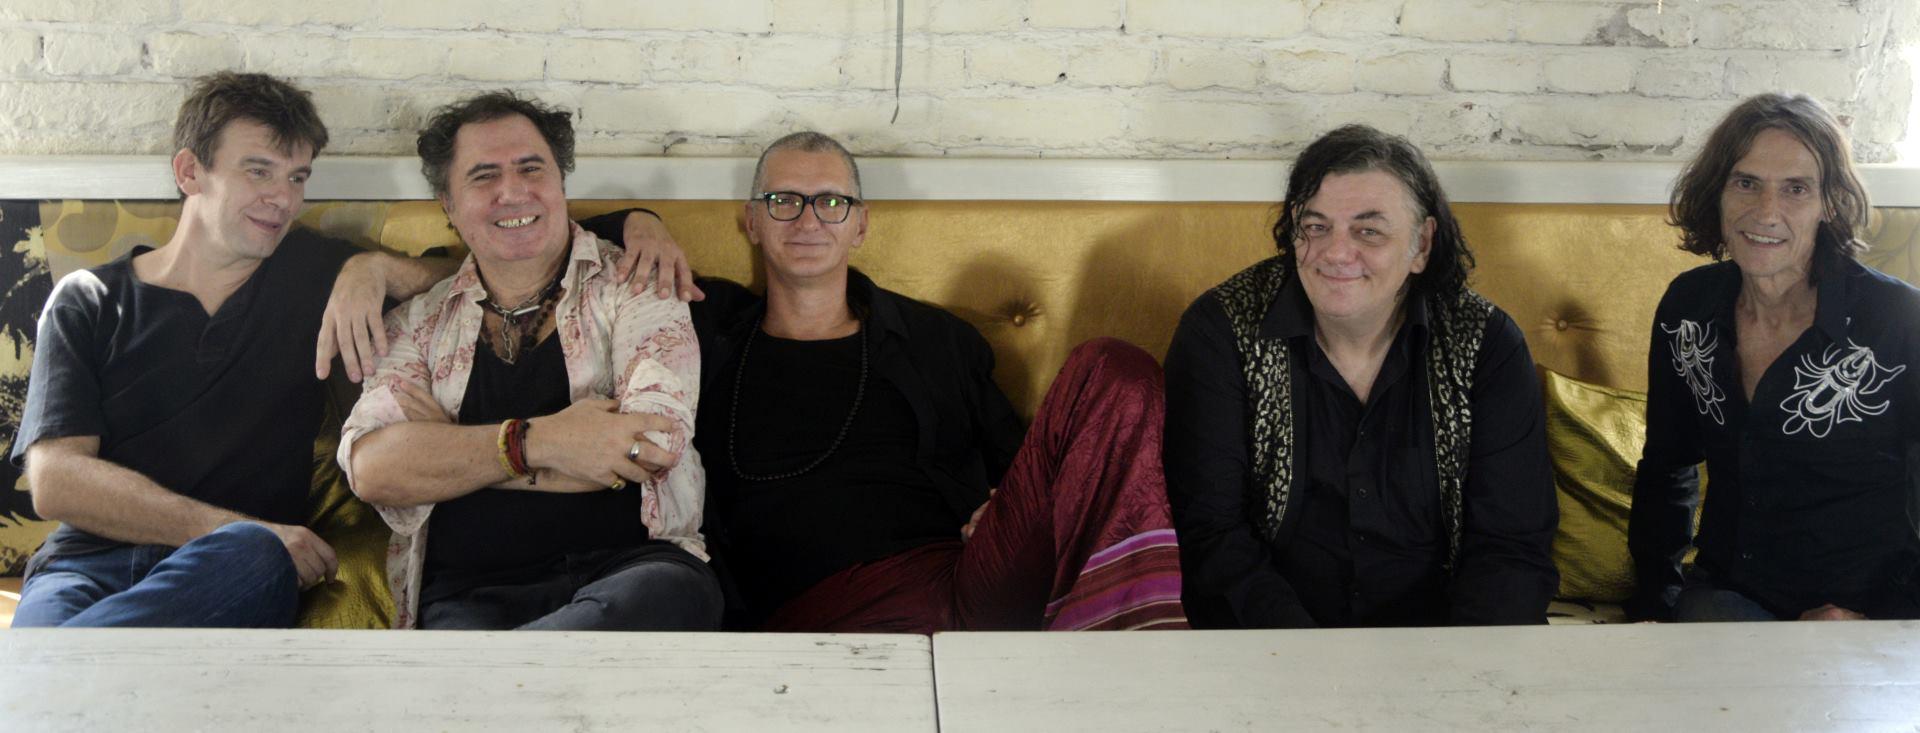 Koncert kultne beogradske rock grupe 'Električni orgazam'